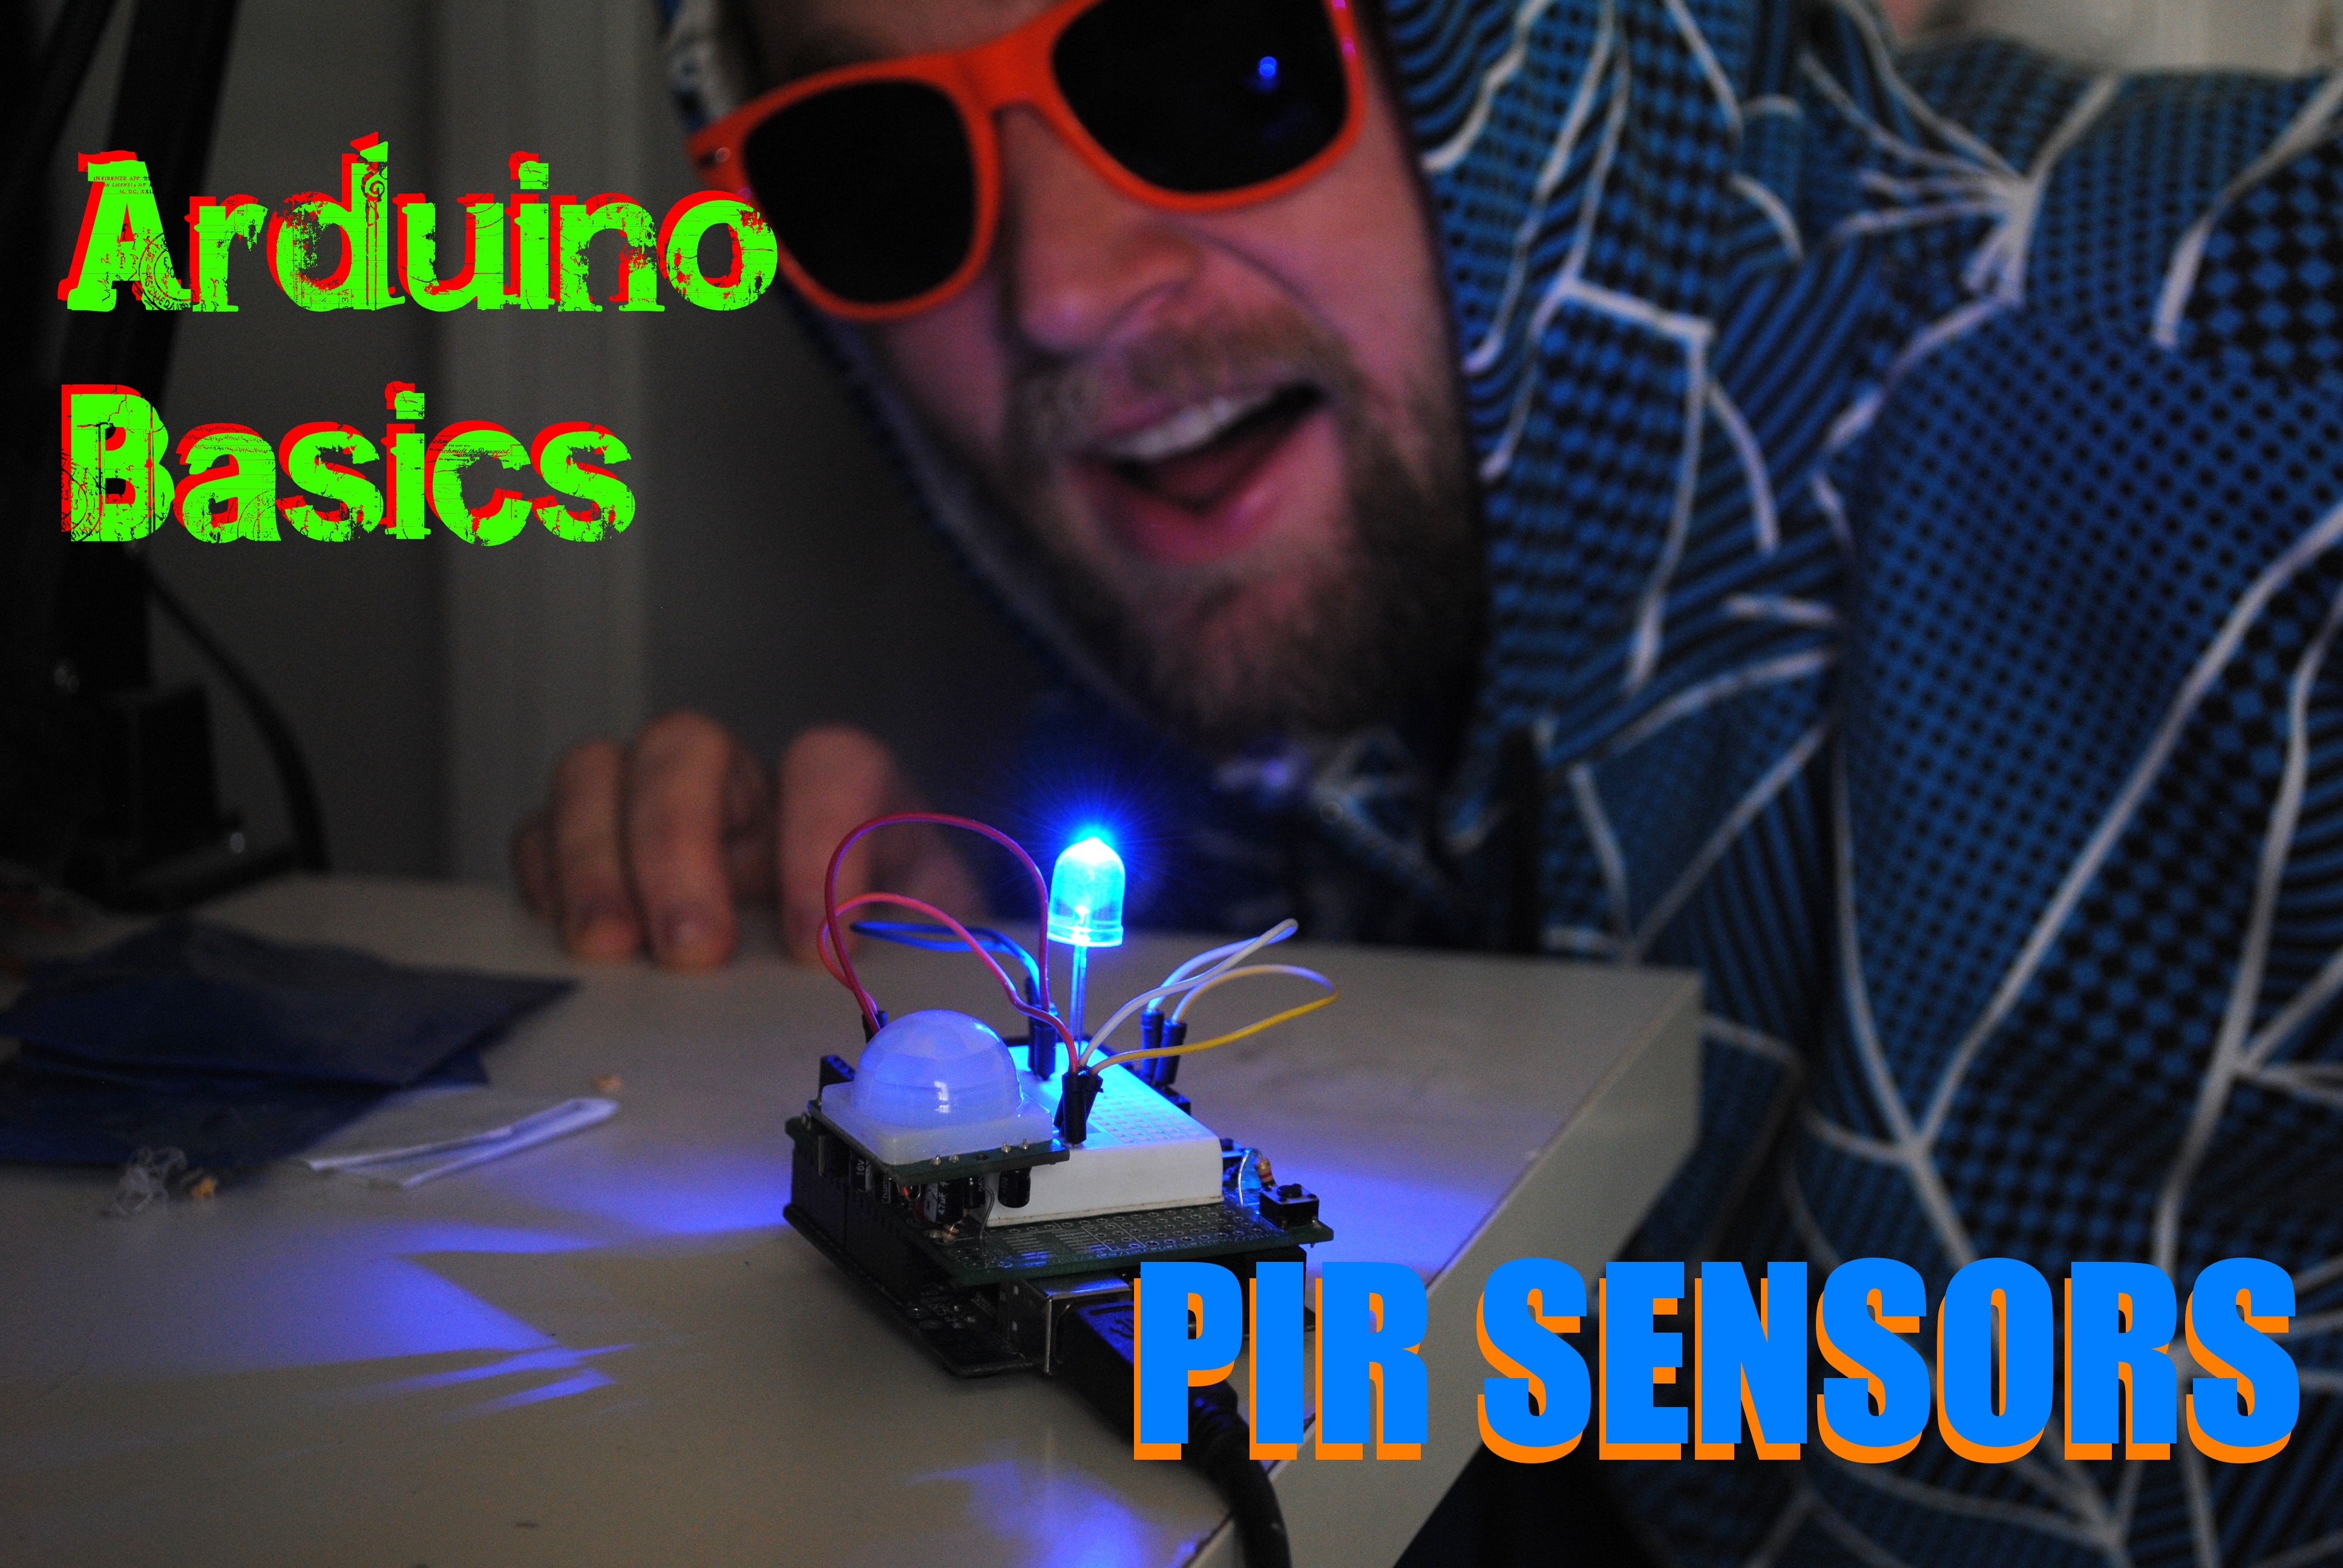 Arduino Basics: PIR Sensors